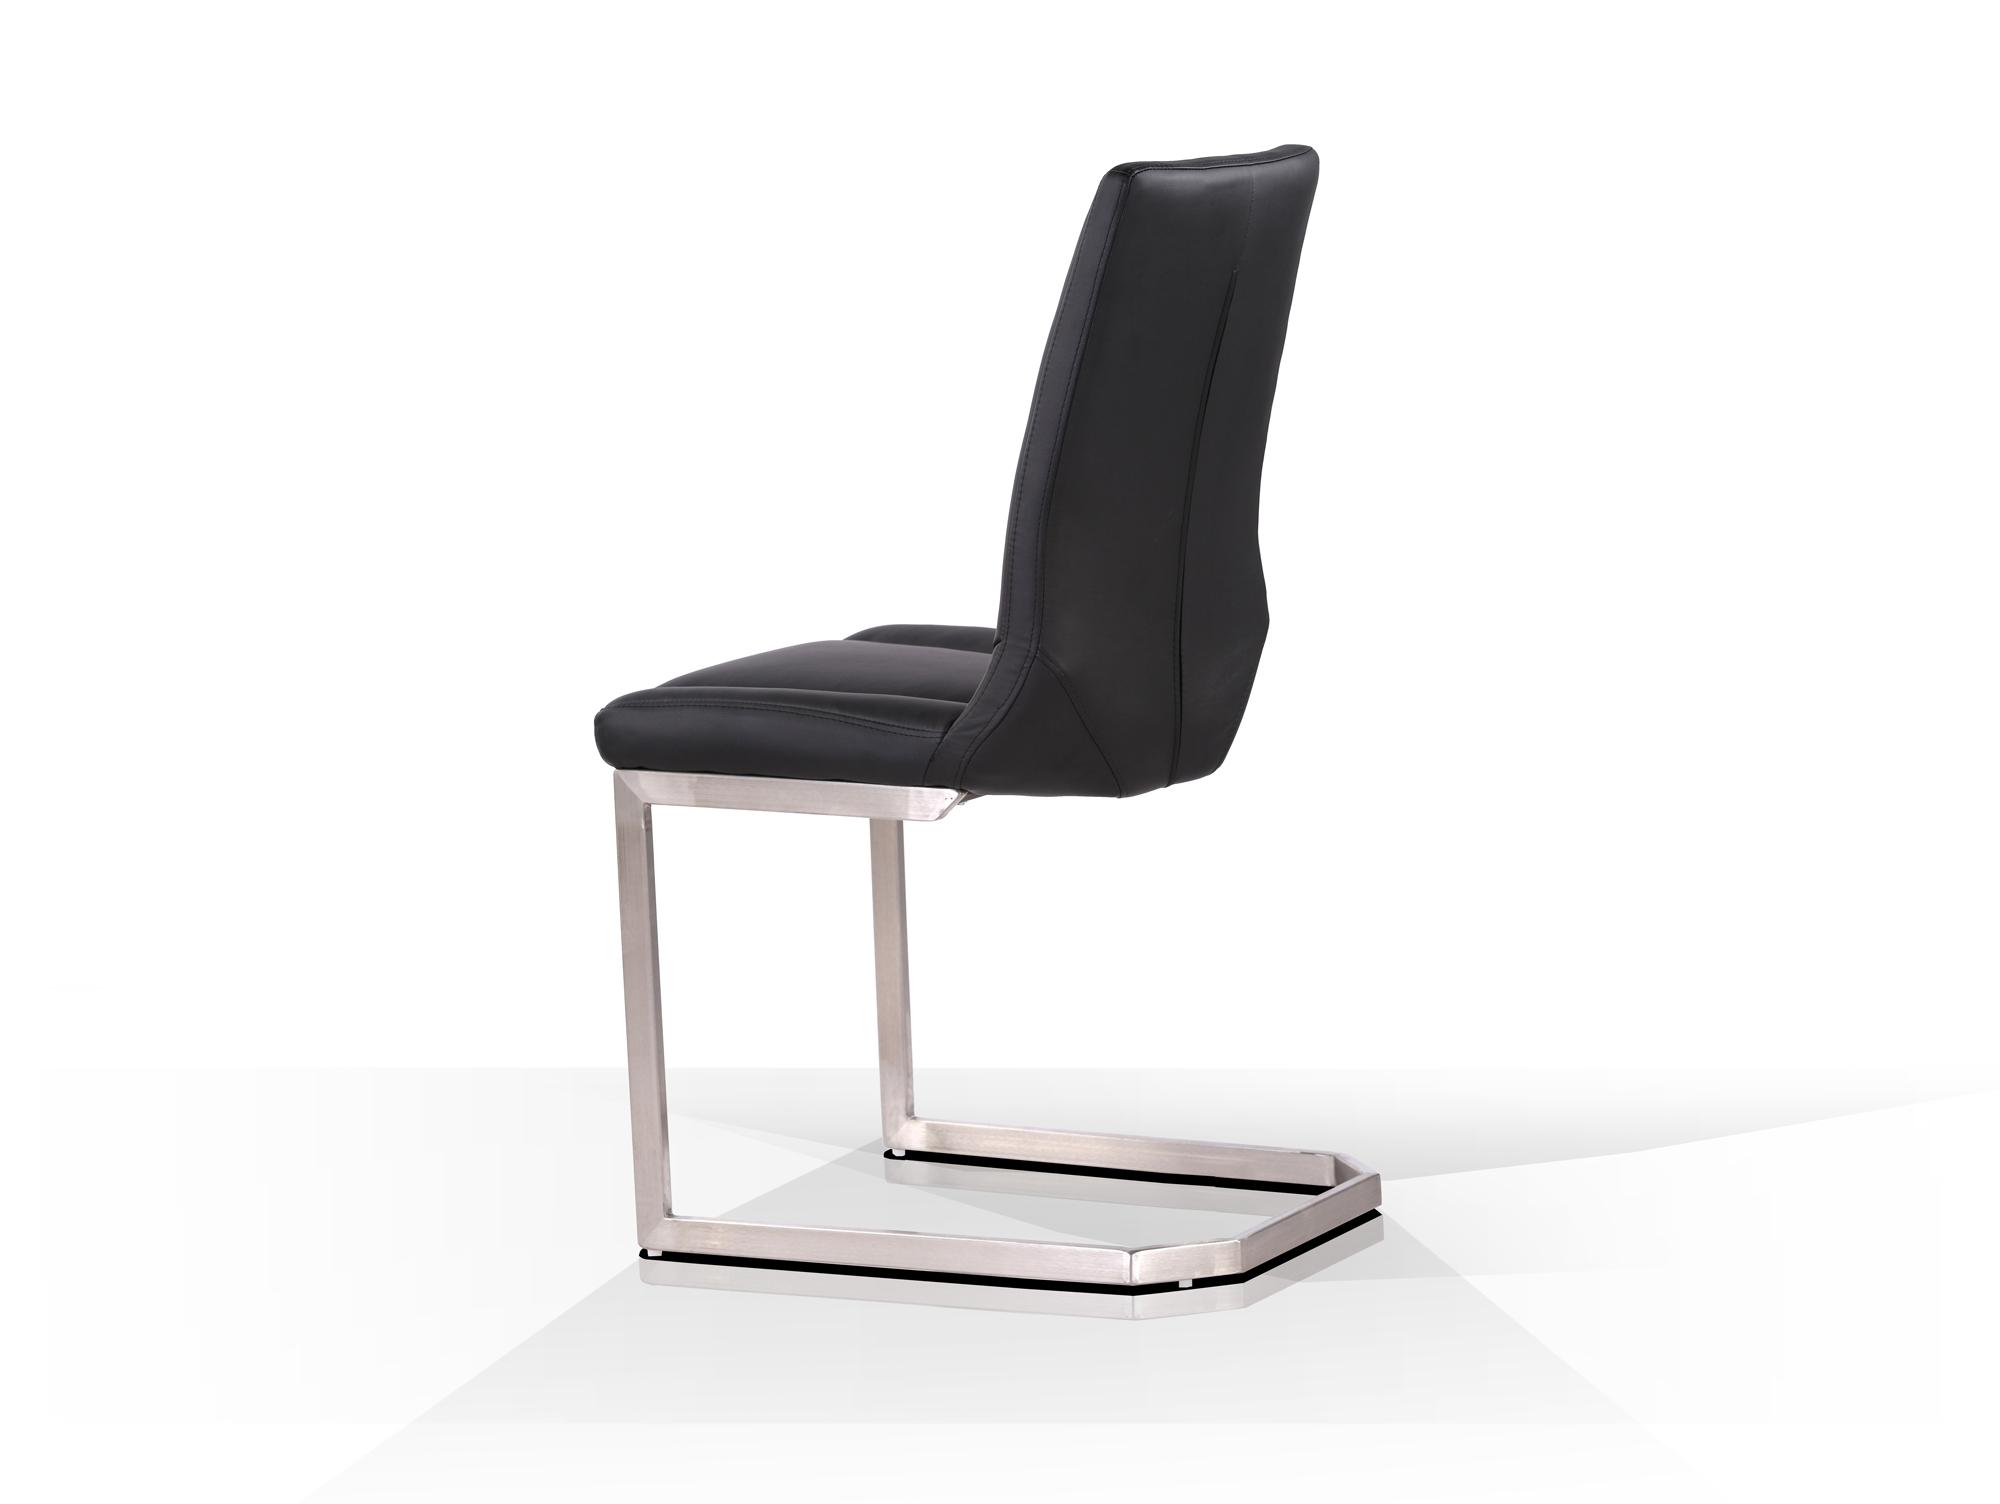 johanna freischwinger schwarz. Black Bedroom Furniture Sets. Home Design Ideas